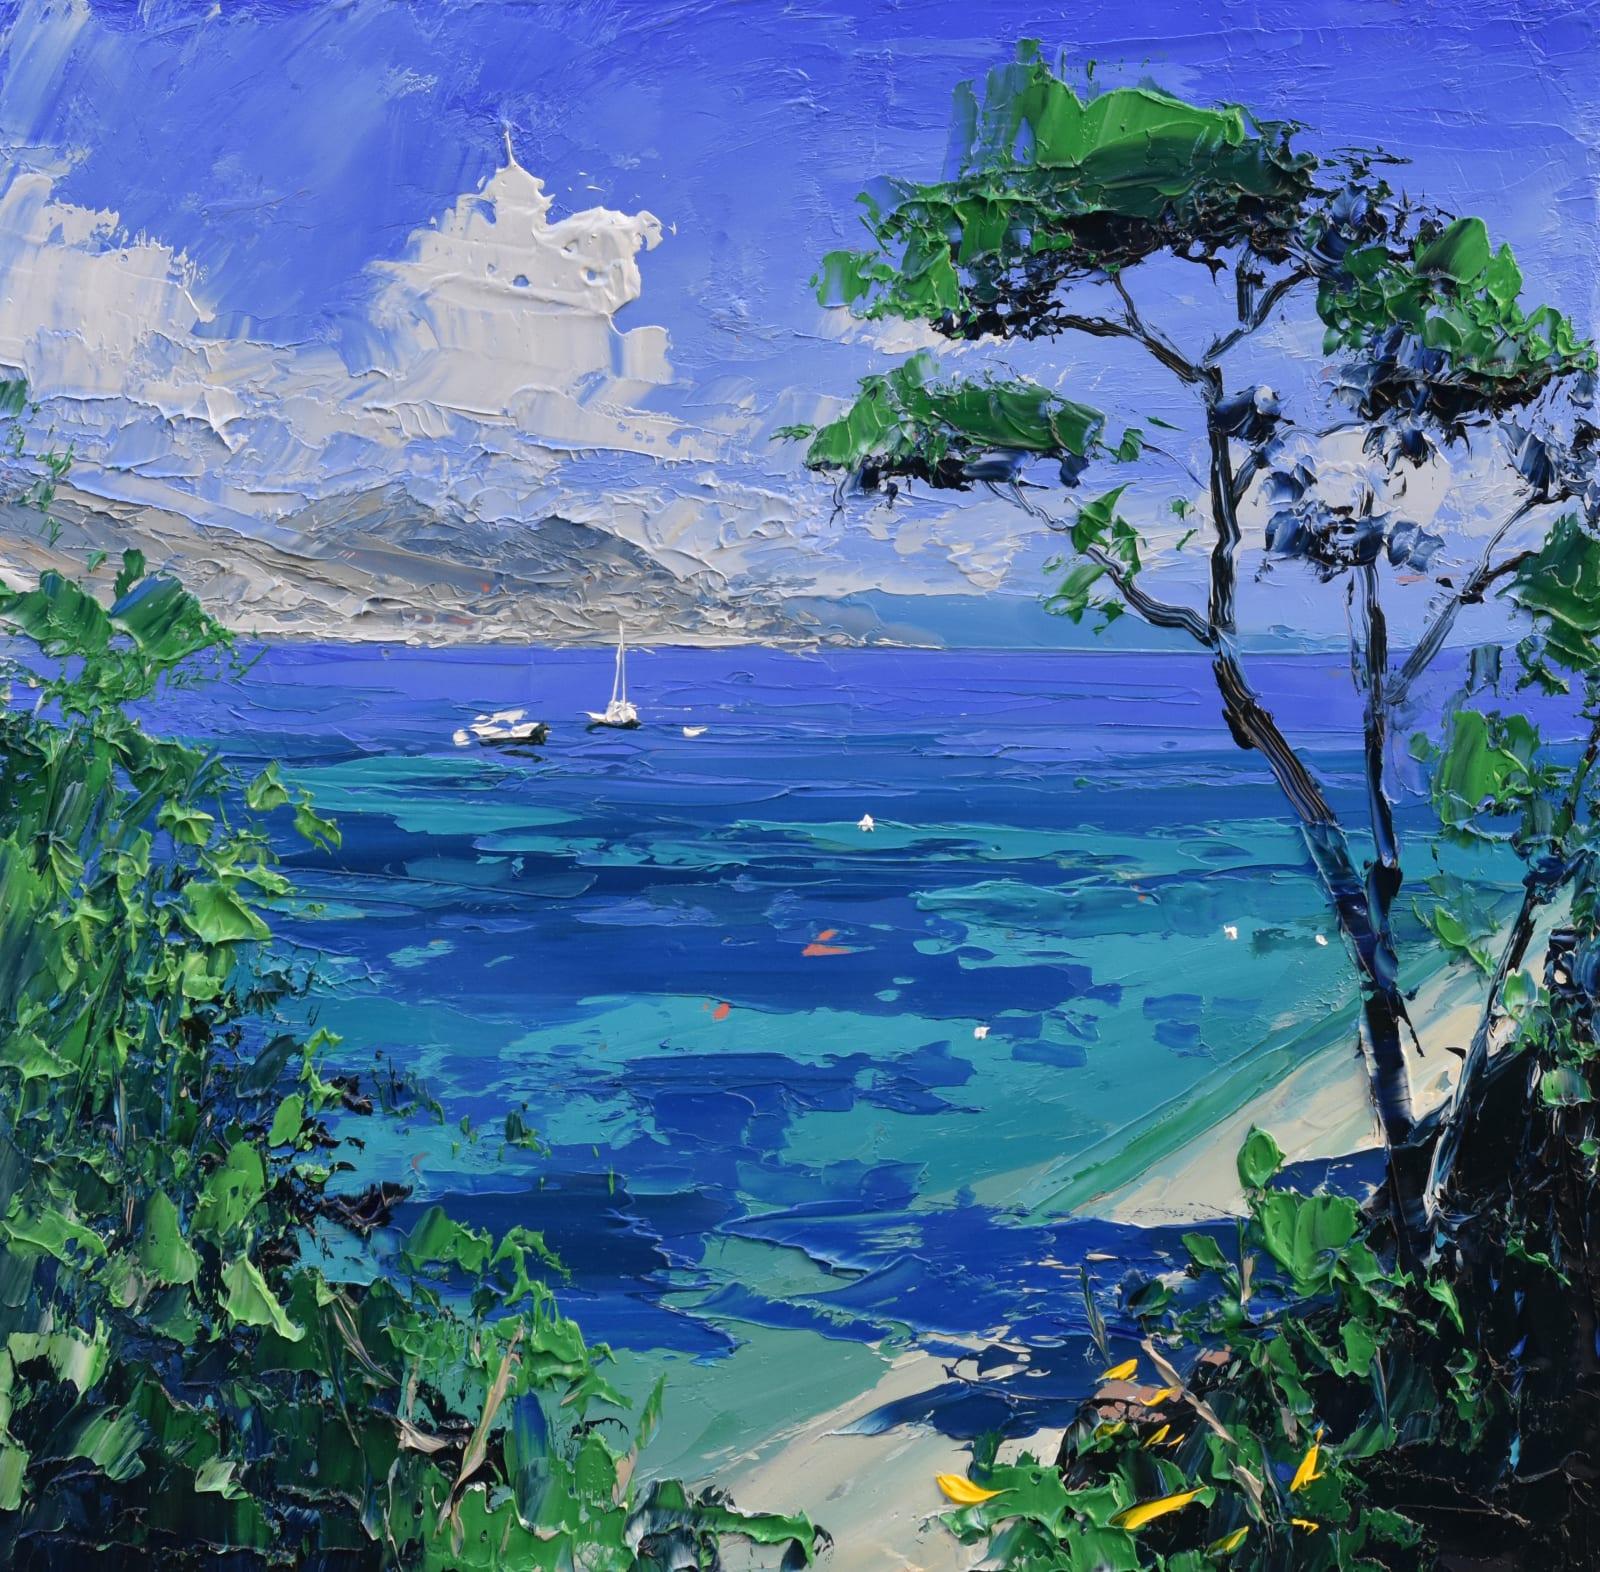 Colin Carruthers, OCEAN LIGHT, CAP FERRAT